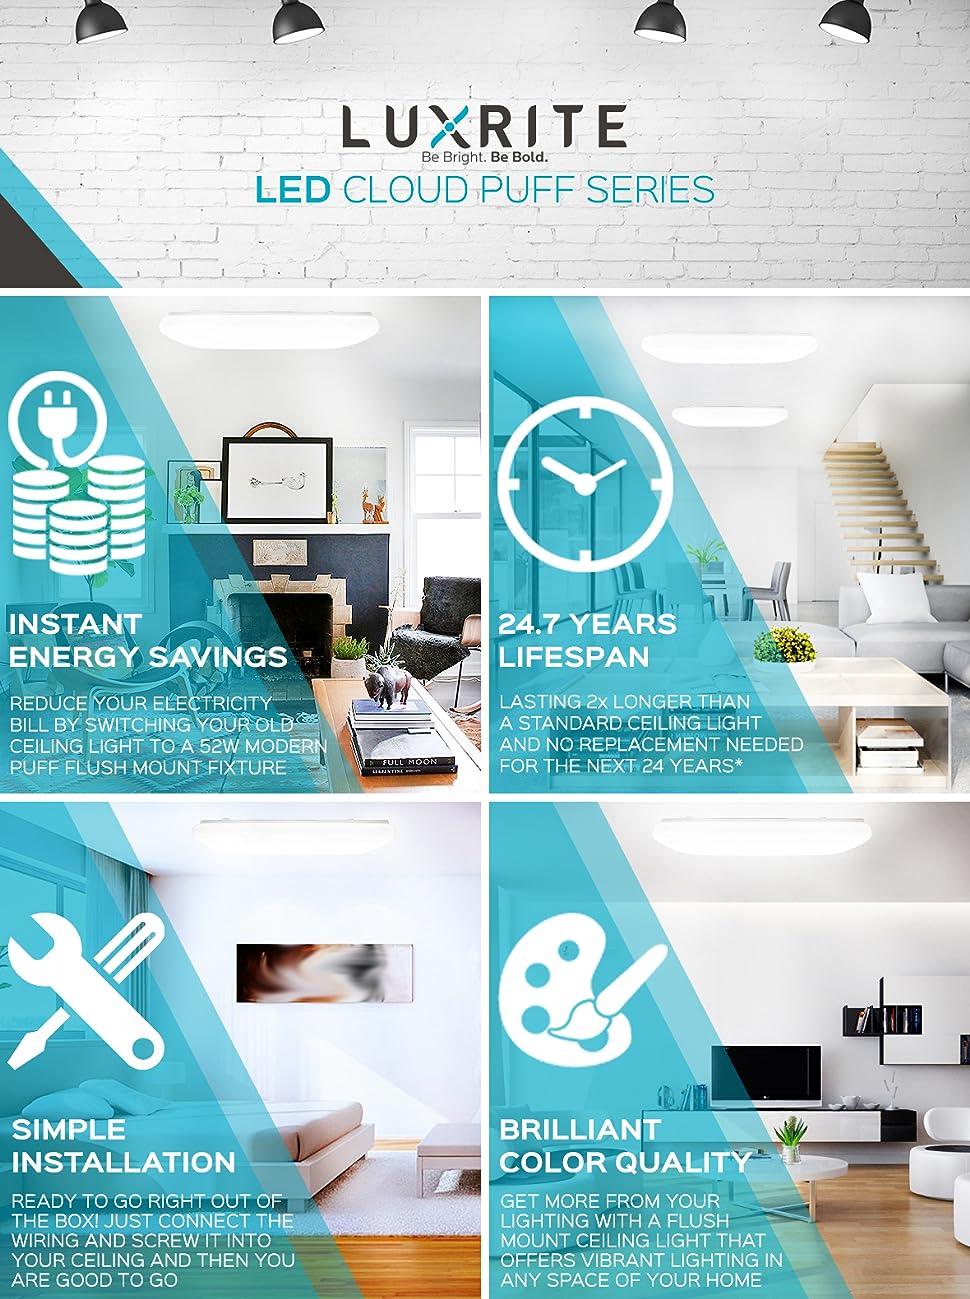 Luxrite 4FT Puff LED Flush Mount Ceiling Light Fixture, 52W, 4000K ...